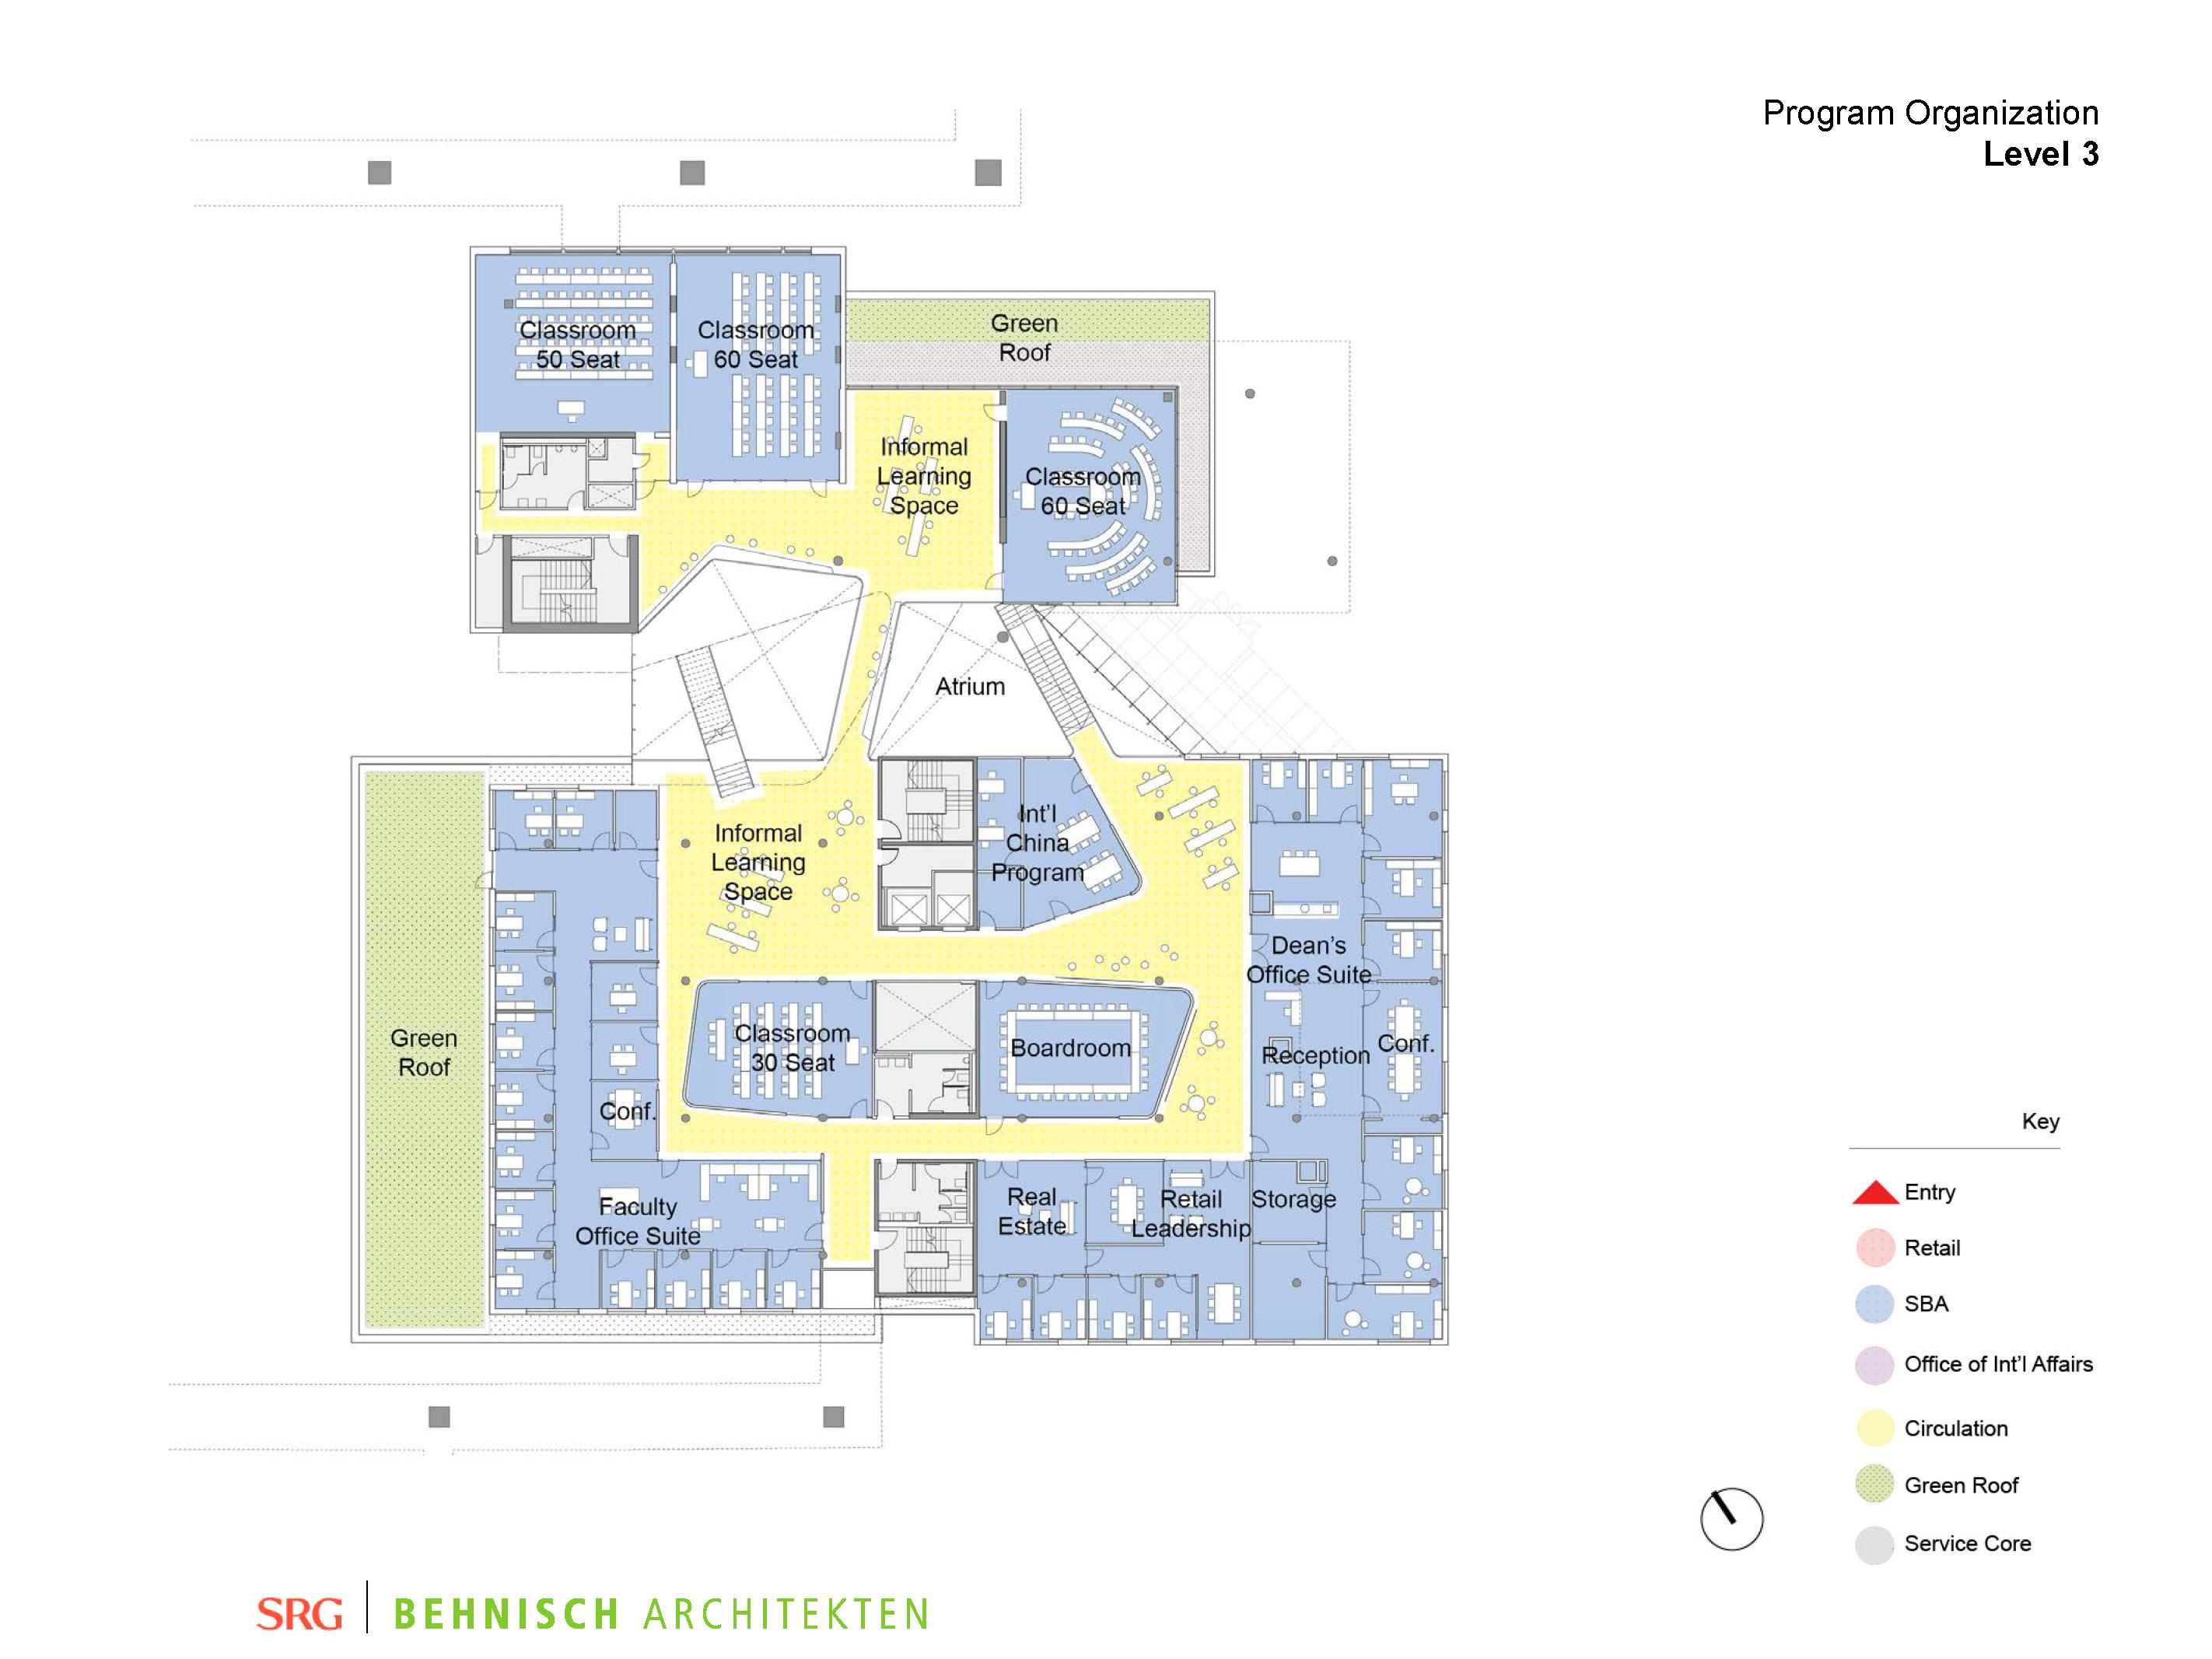 PSU School of Business Administration